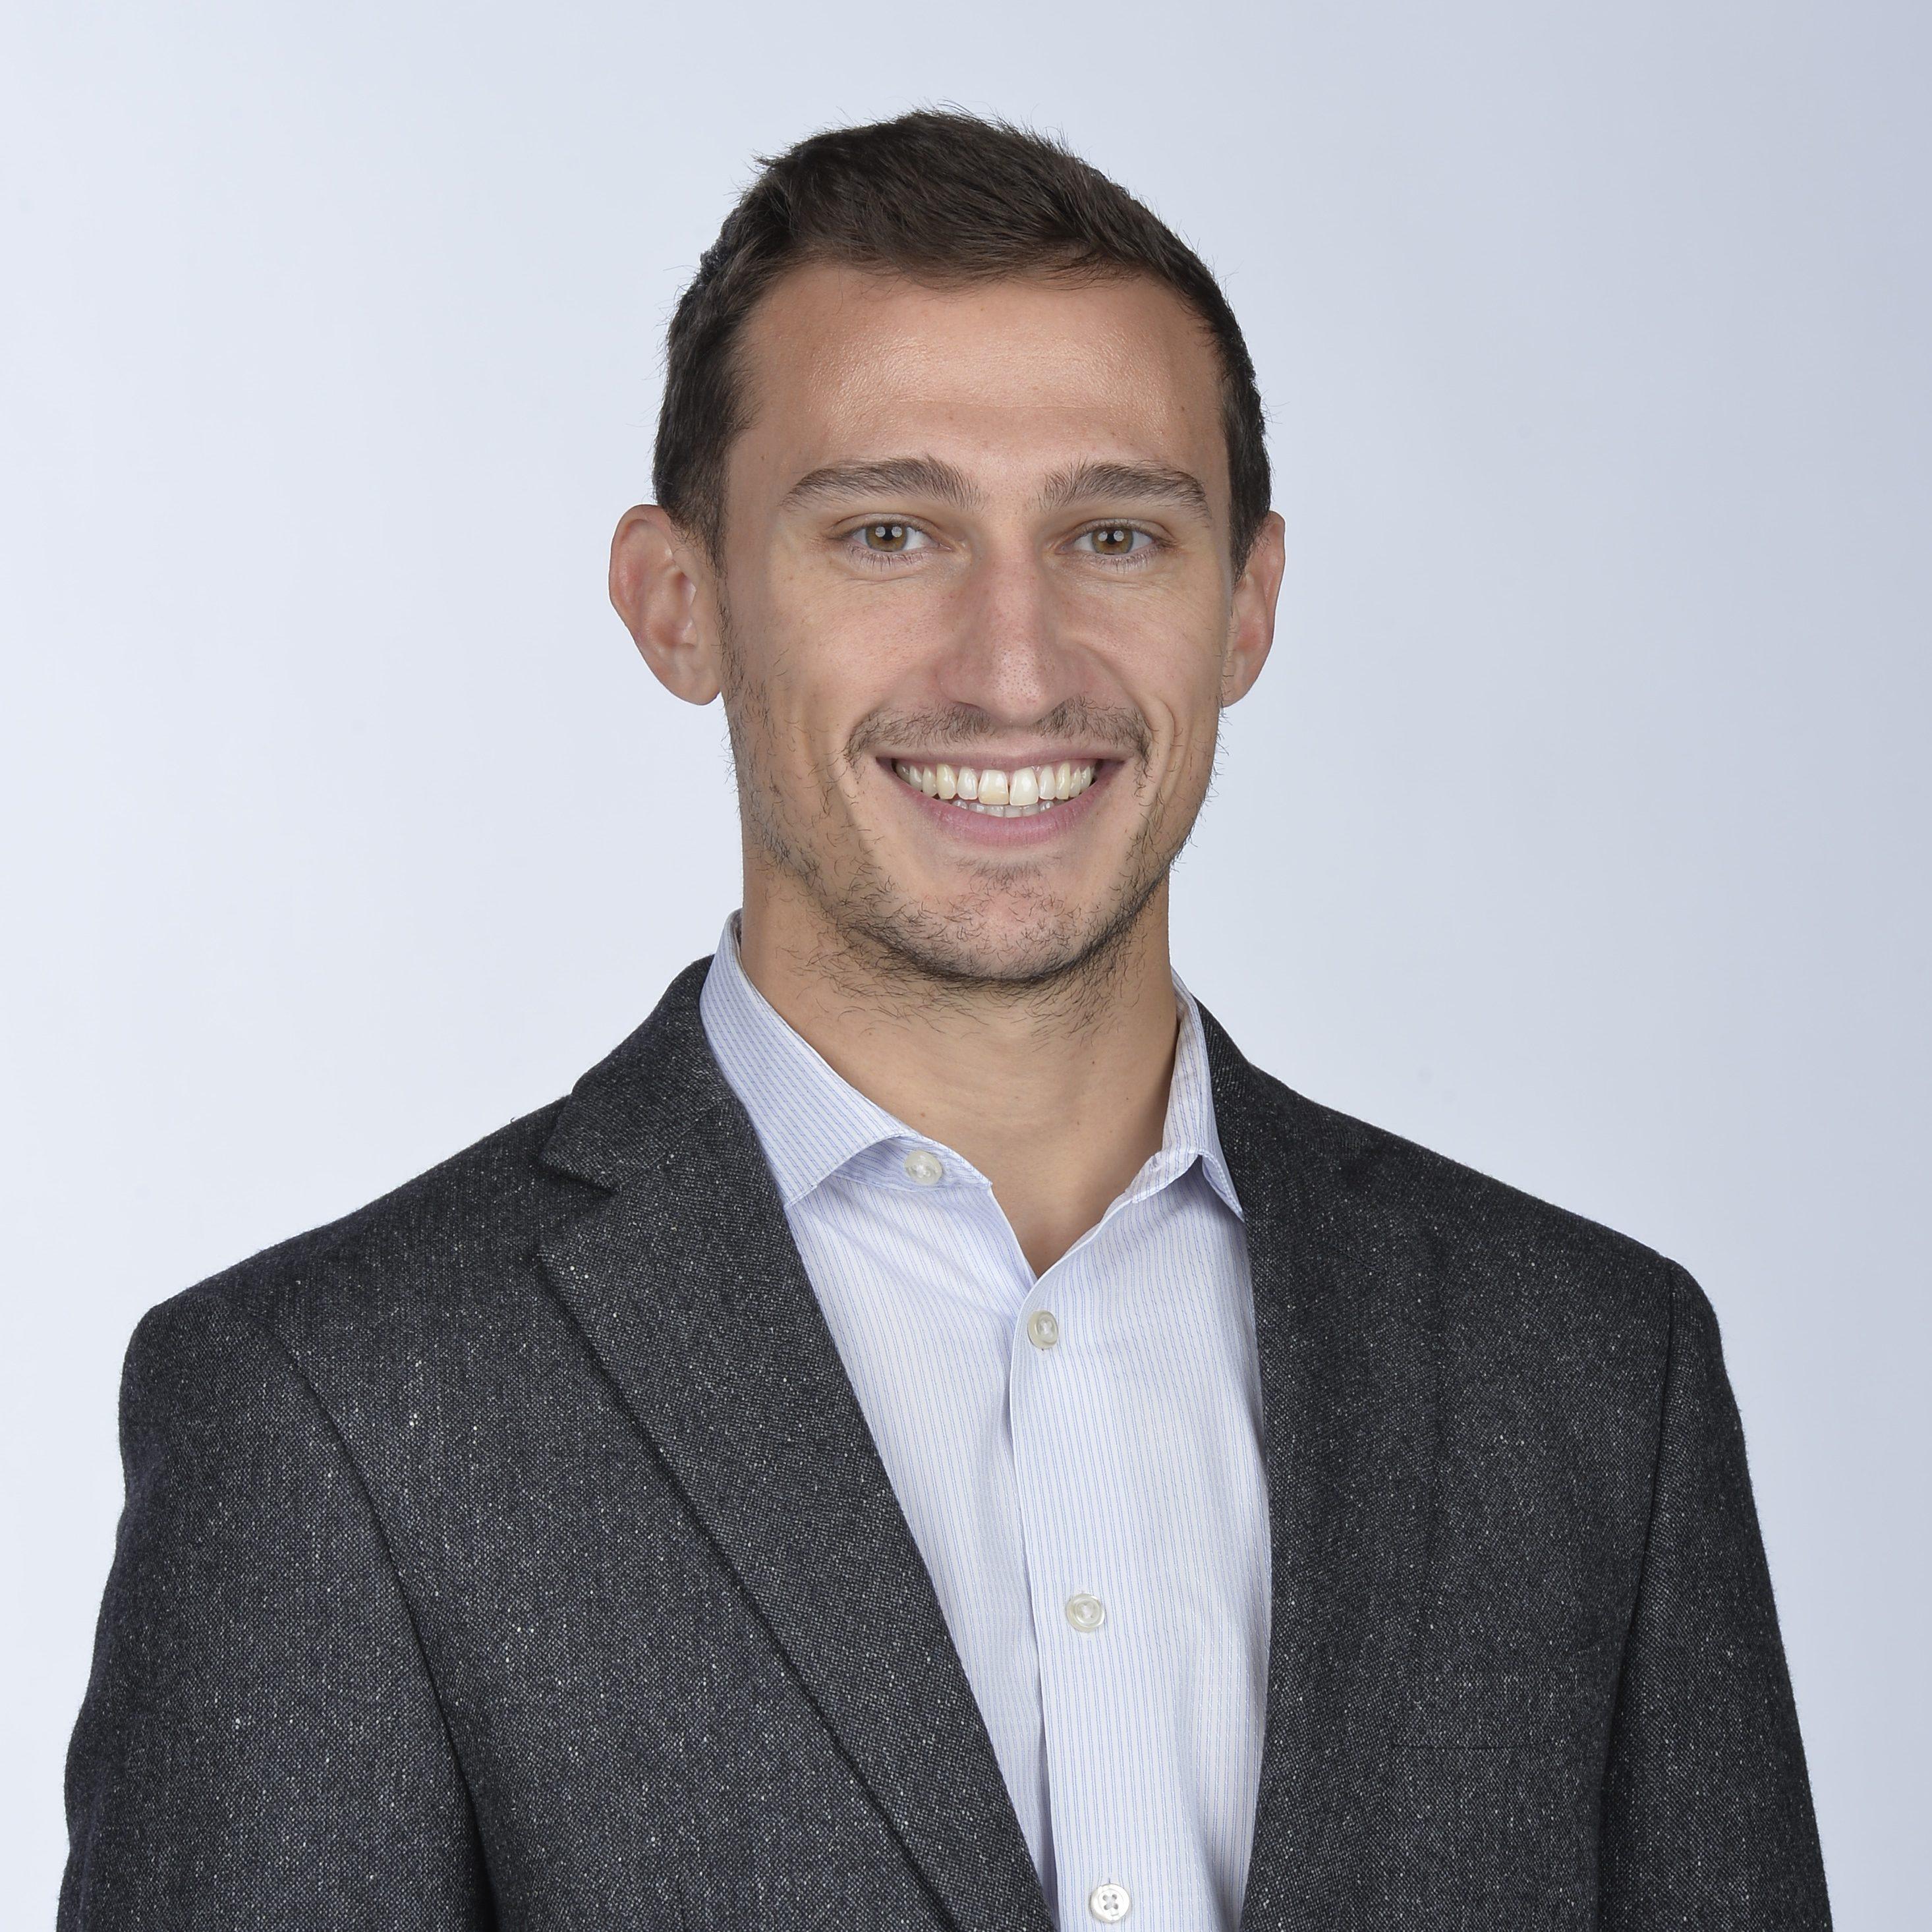 Chris Kocolnas - Video & Travel Coordinator